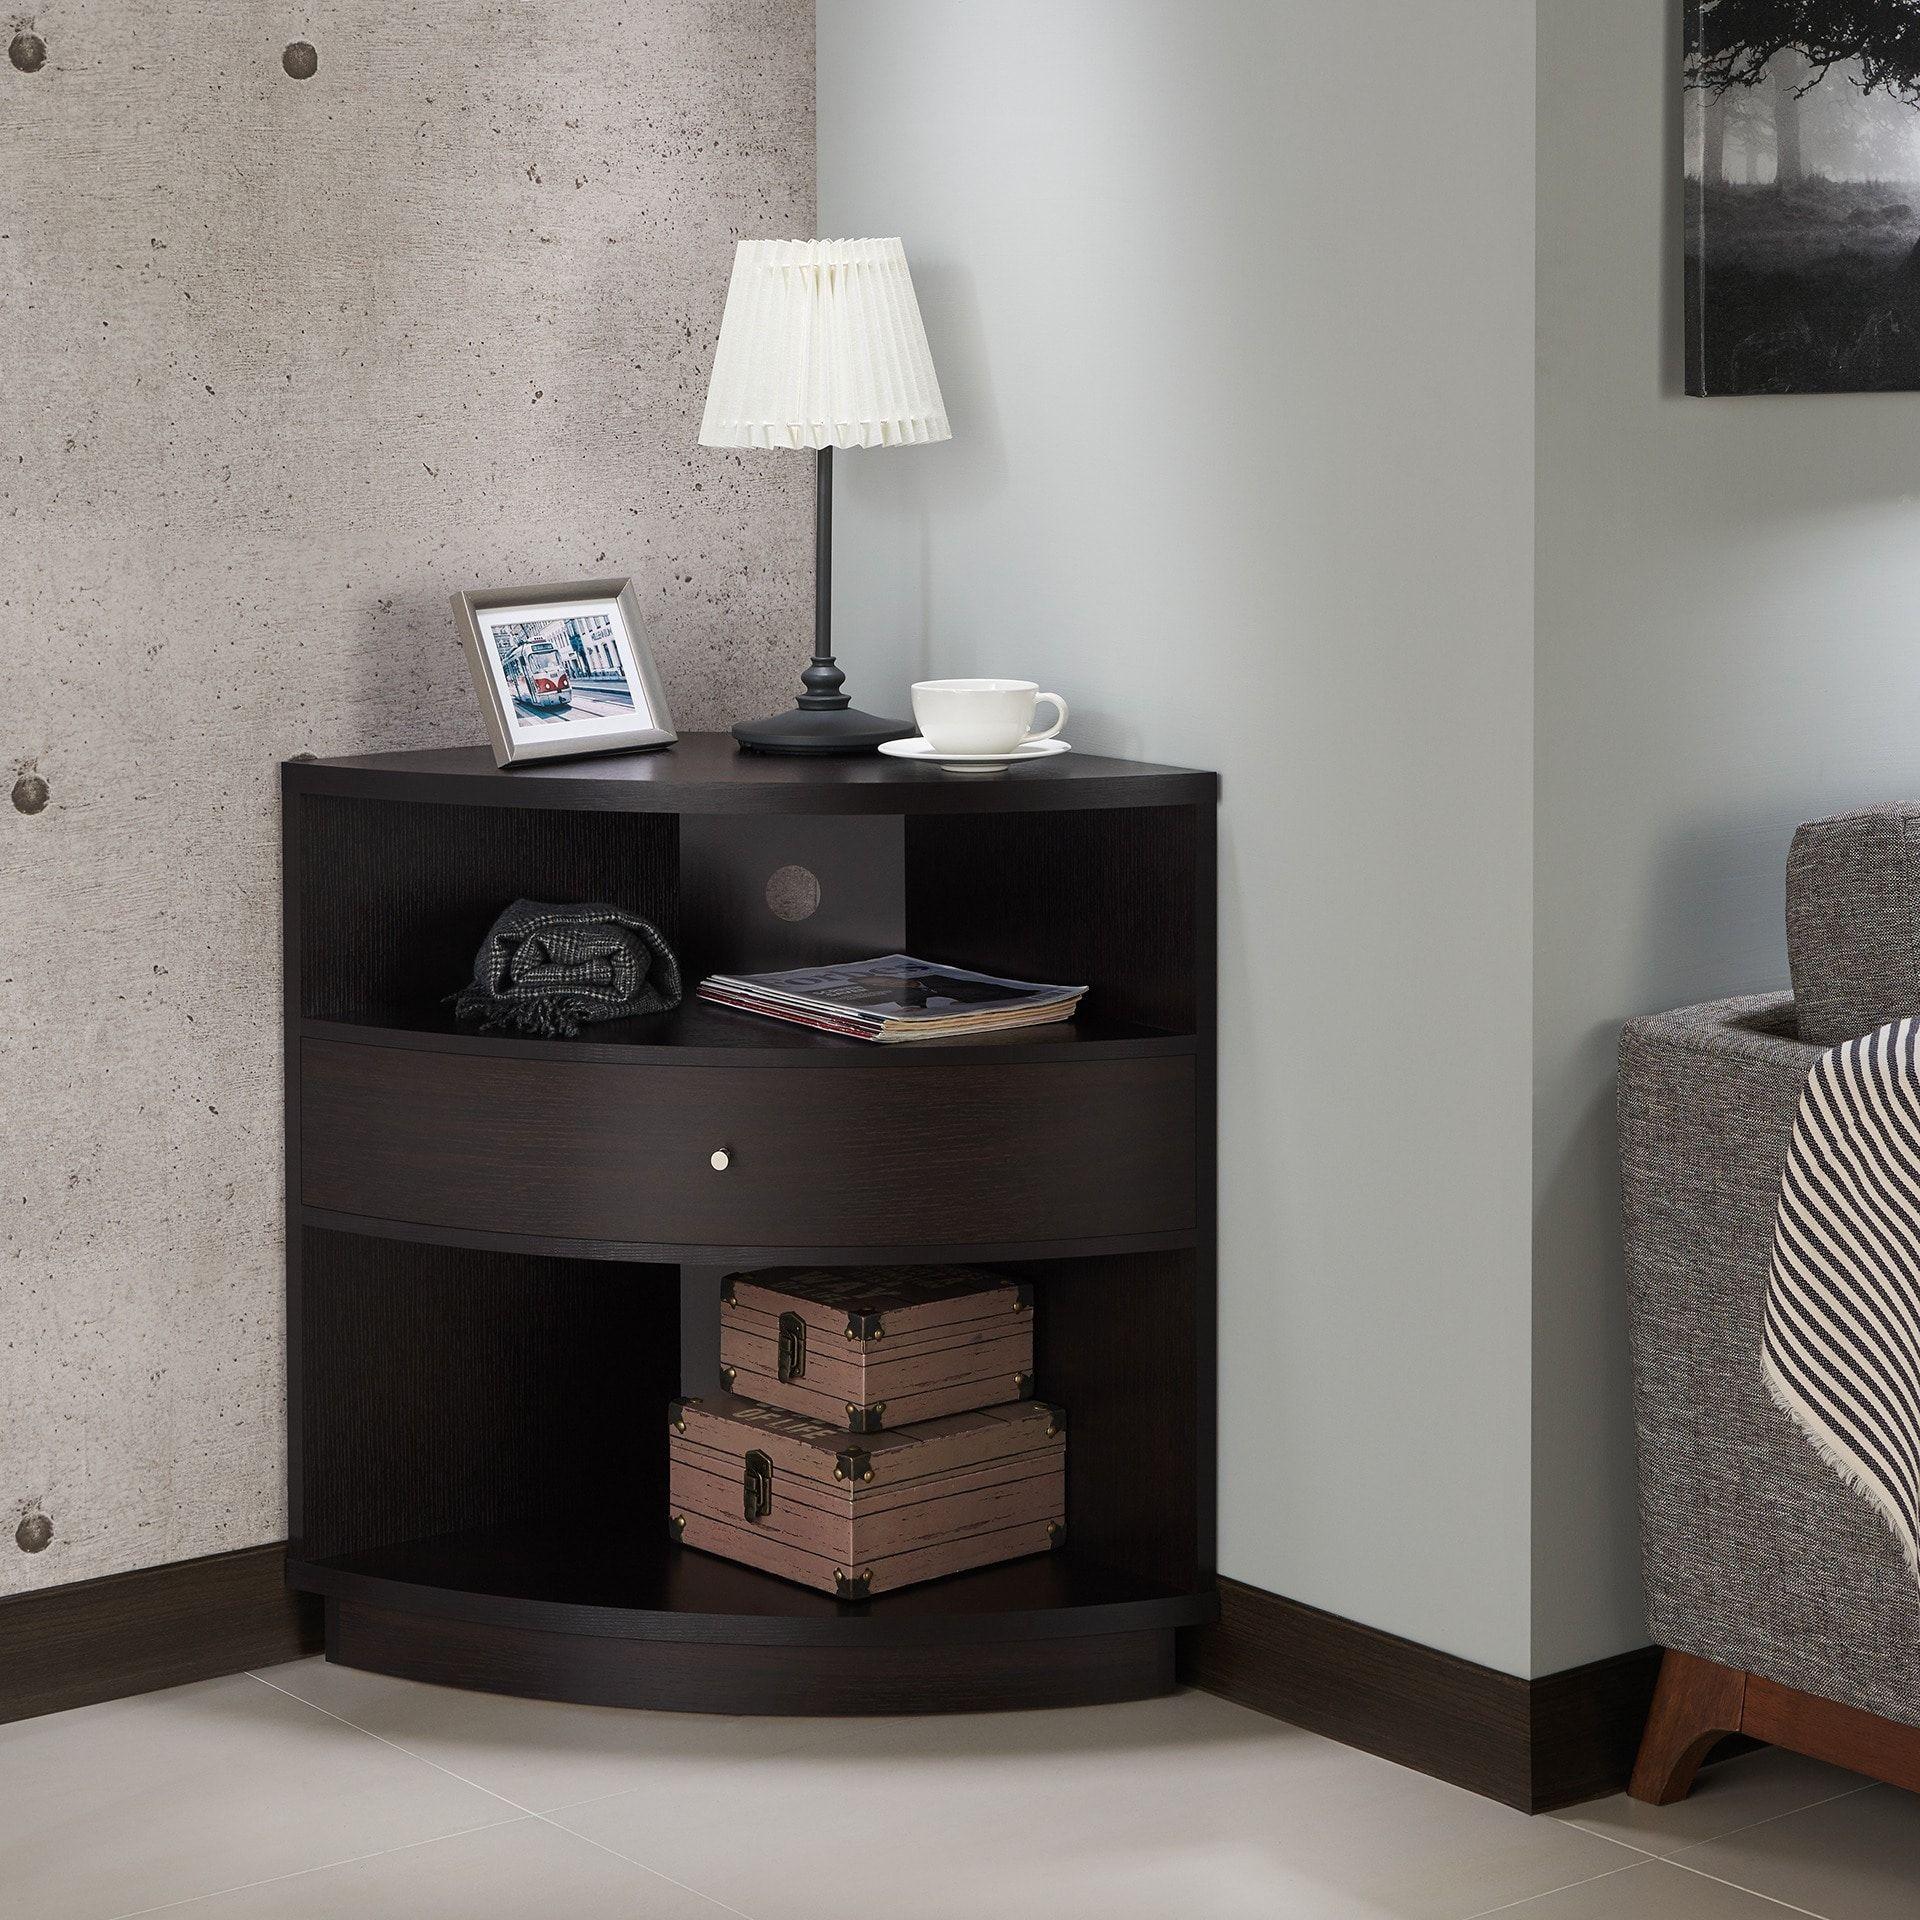 Furniture Of America Aishe Contemporary Multi Shelf Corner Throughout Multi Shelf Corner Buffets (View 3 of 30)